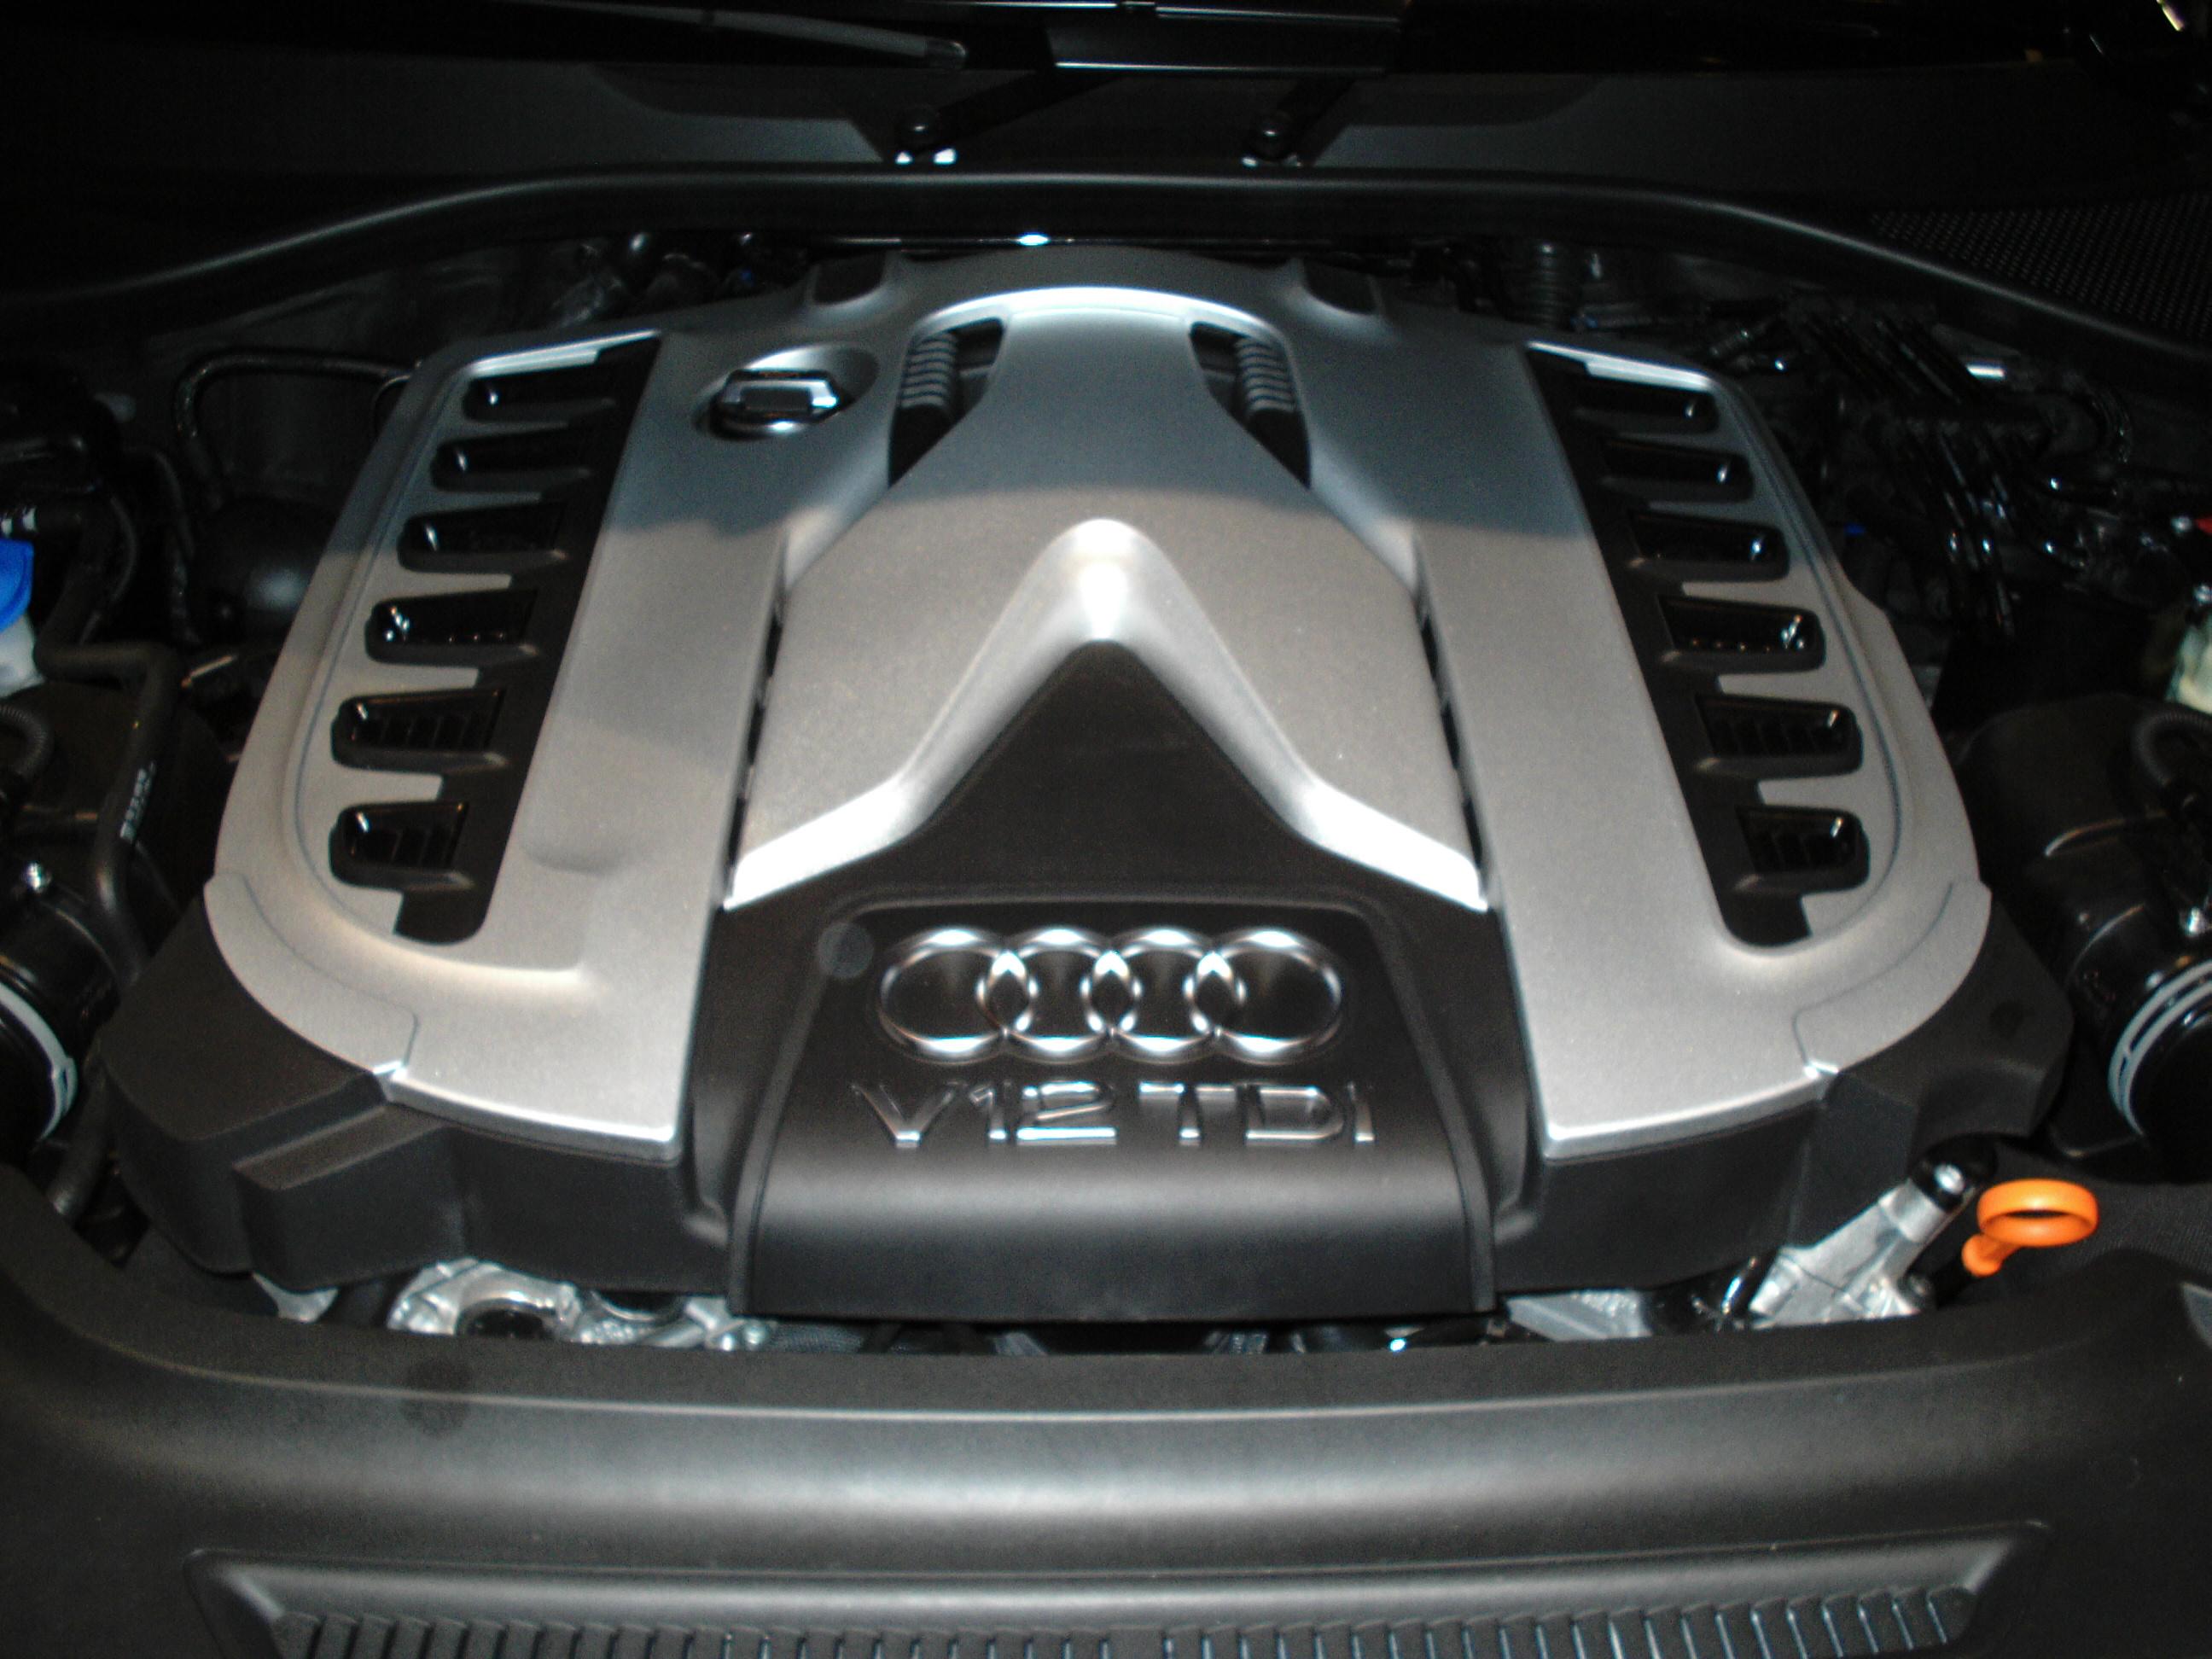 http://upload.wikimedia.org/wikipedia/commons/d/de/Audi_Q7_V12_TDI_engine_front-view.jpg